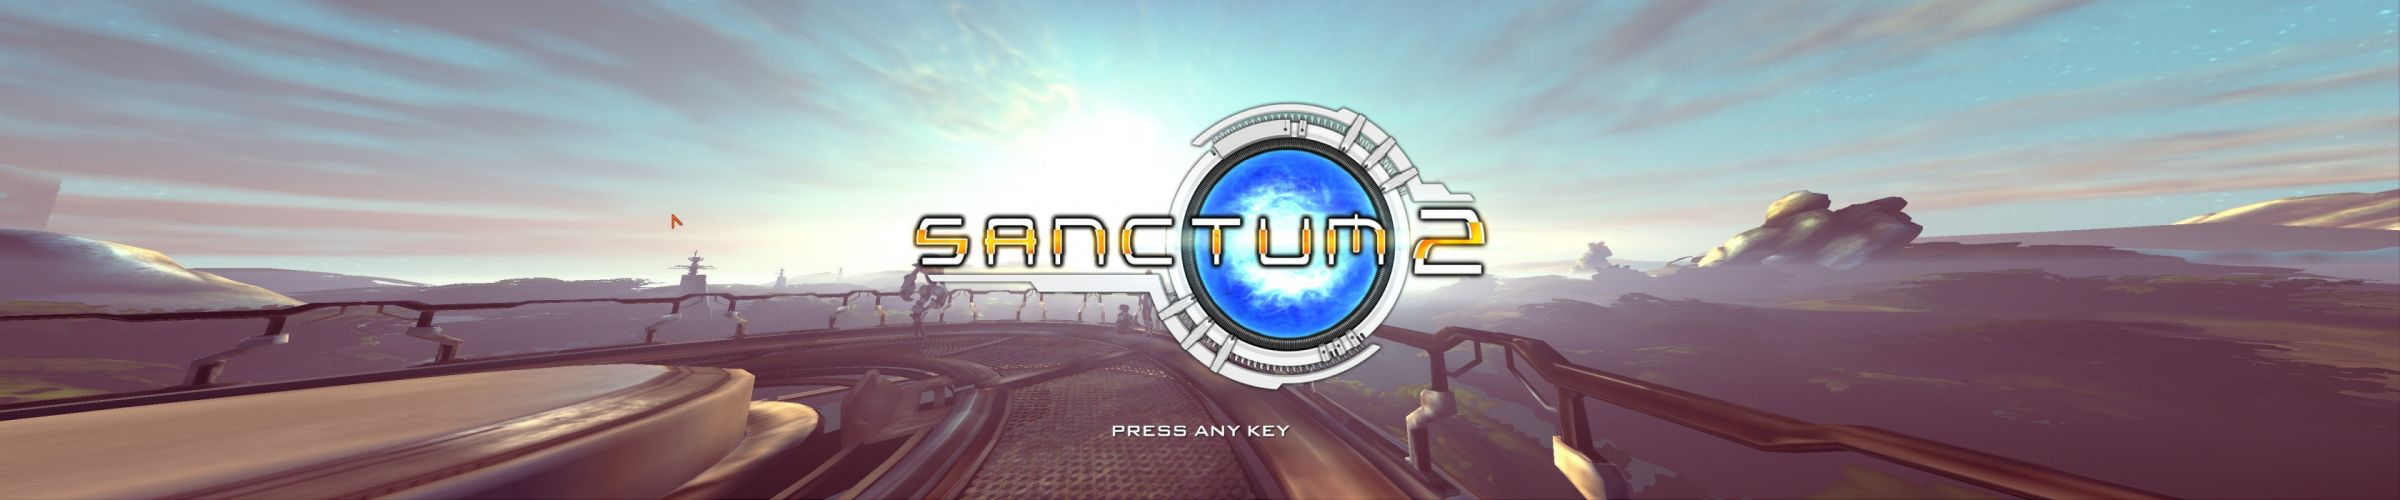 SANCTUM card game sci-fi online shooter rpg h (4) wallpaper